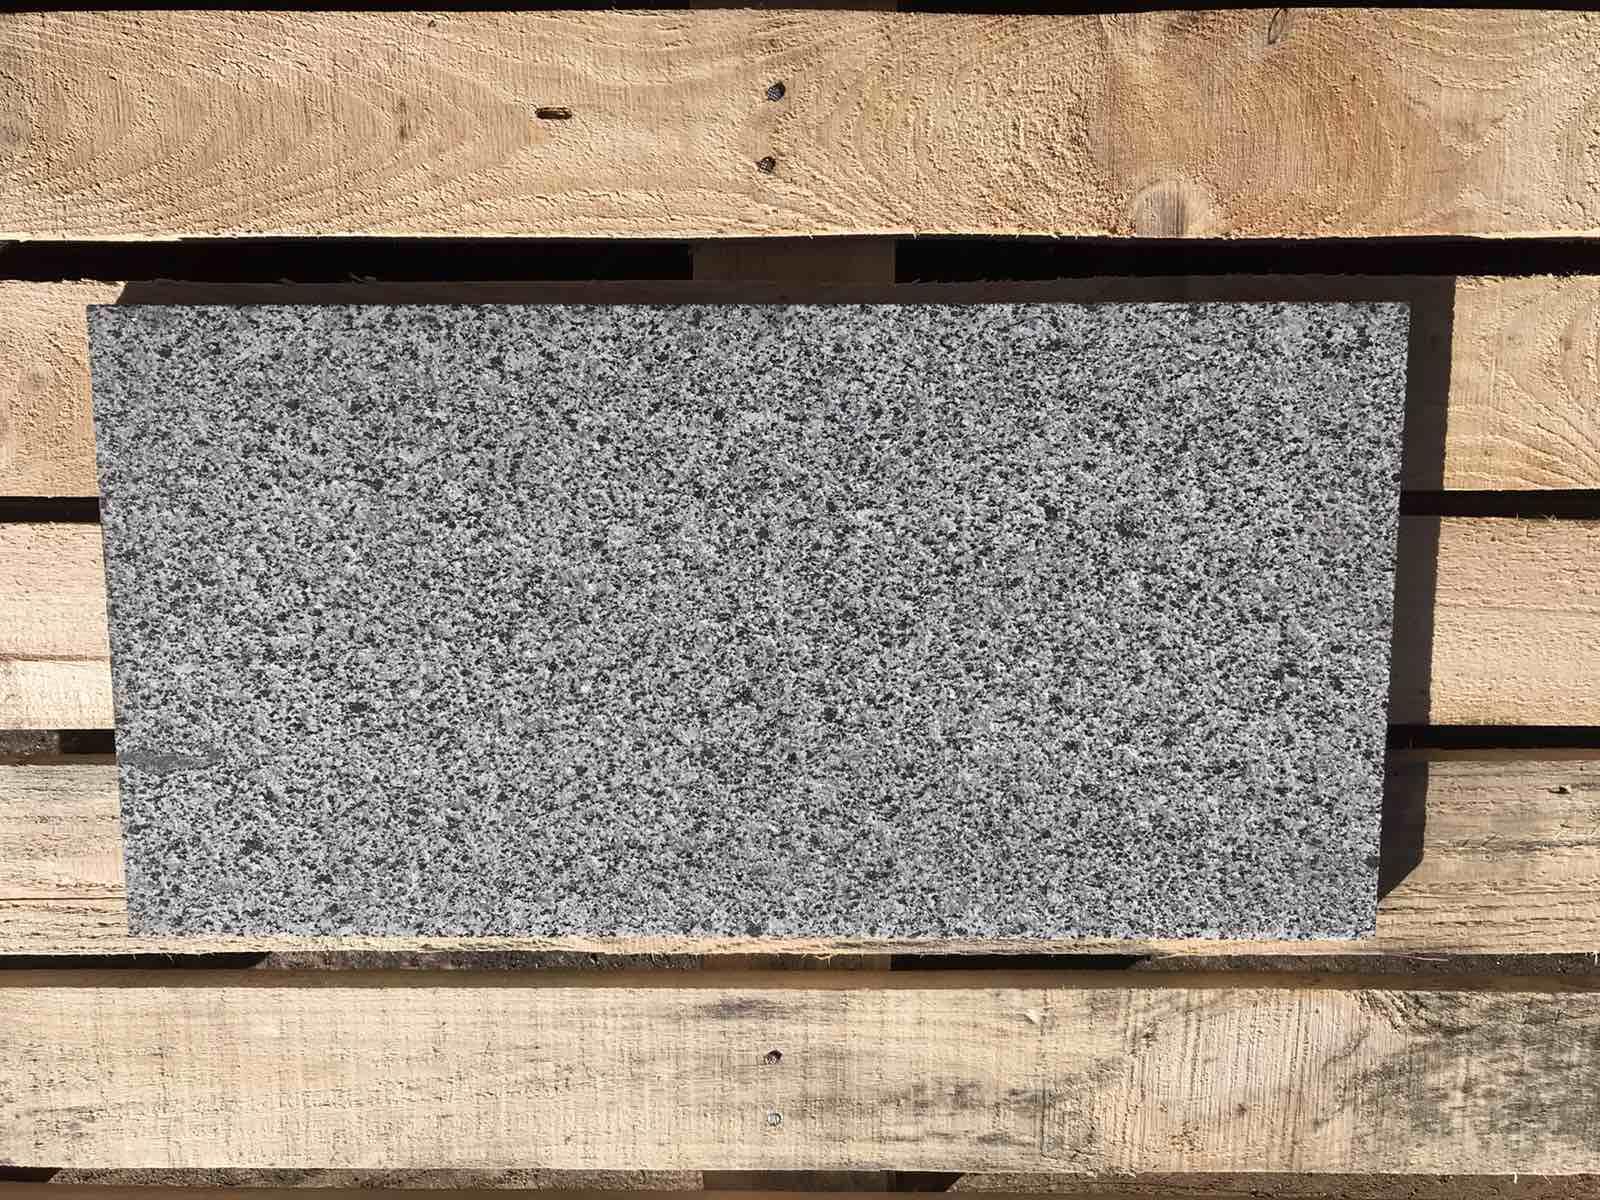 гранитная плитка 600х300